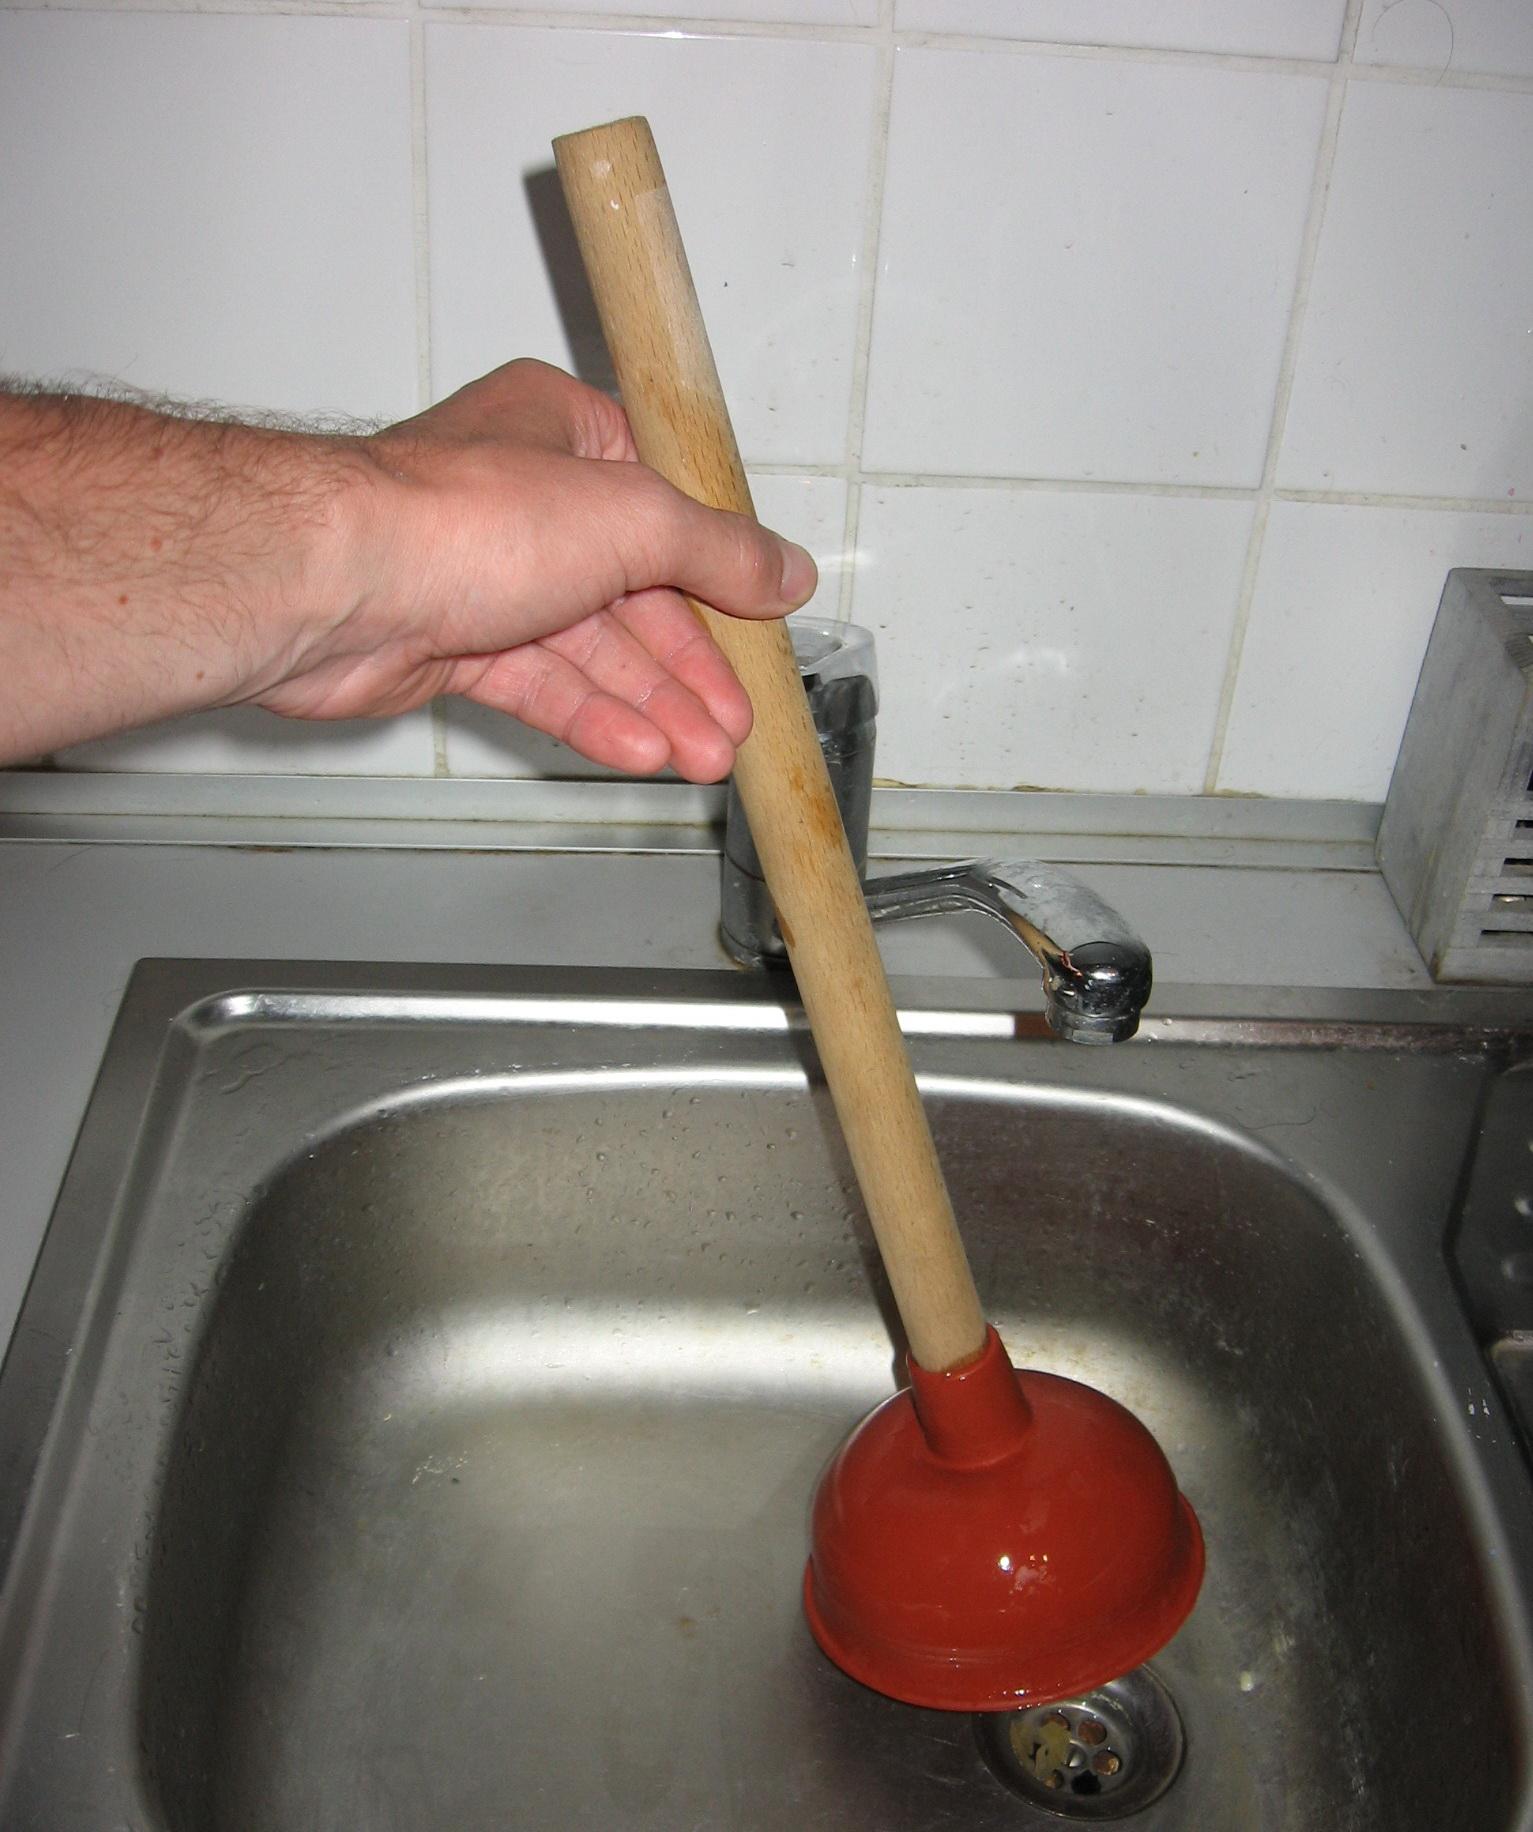 Часто мушки могут завестись в канализационных трубах